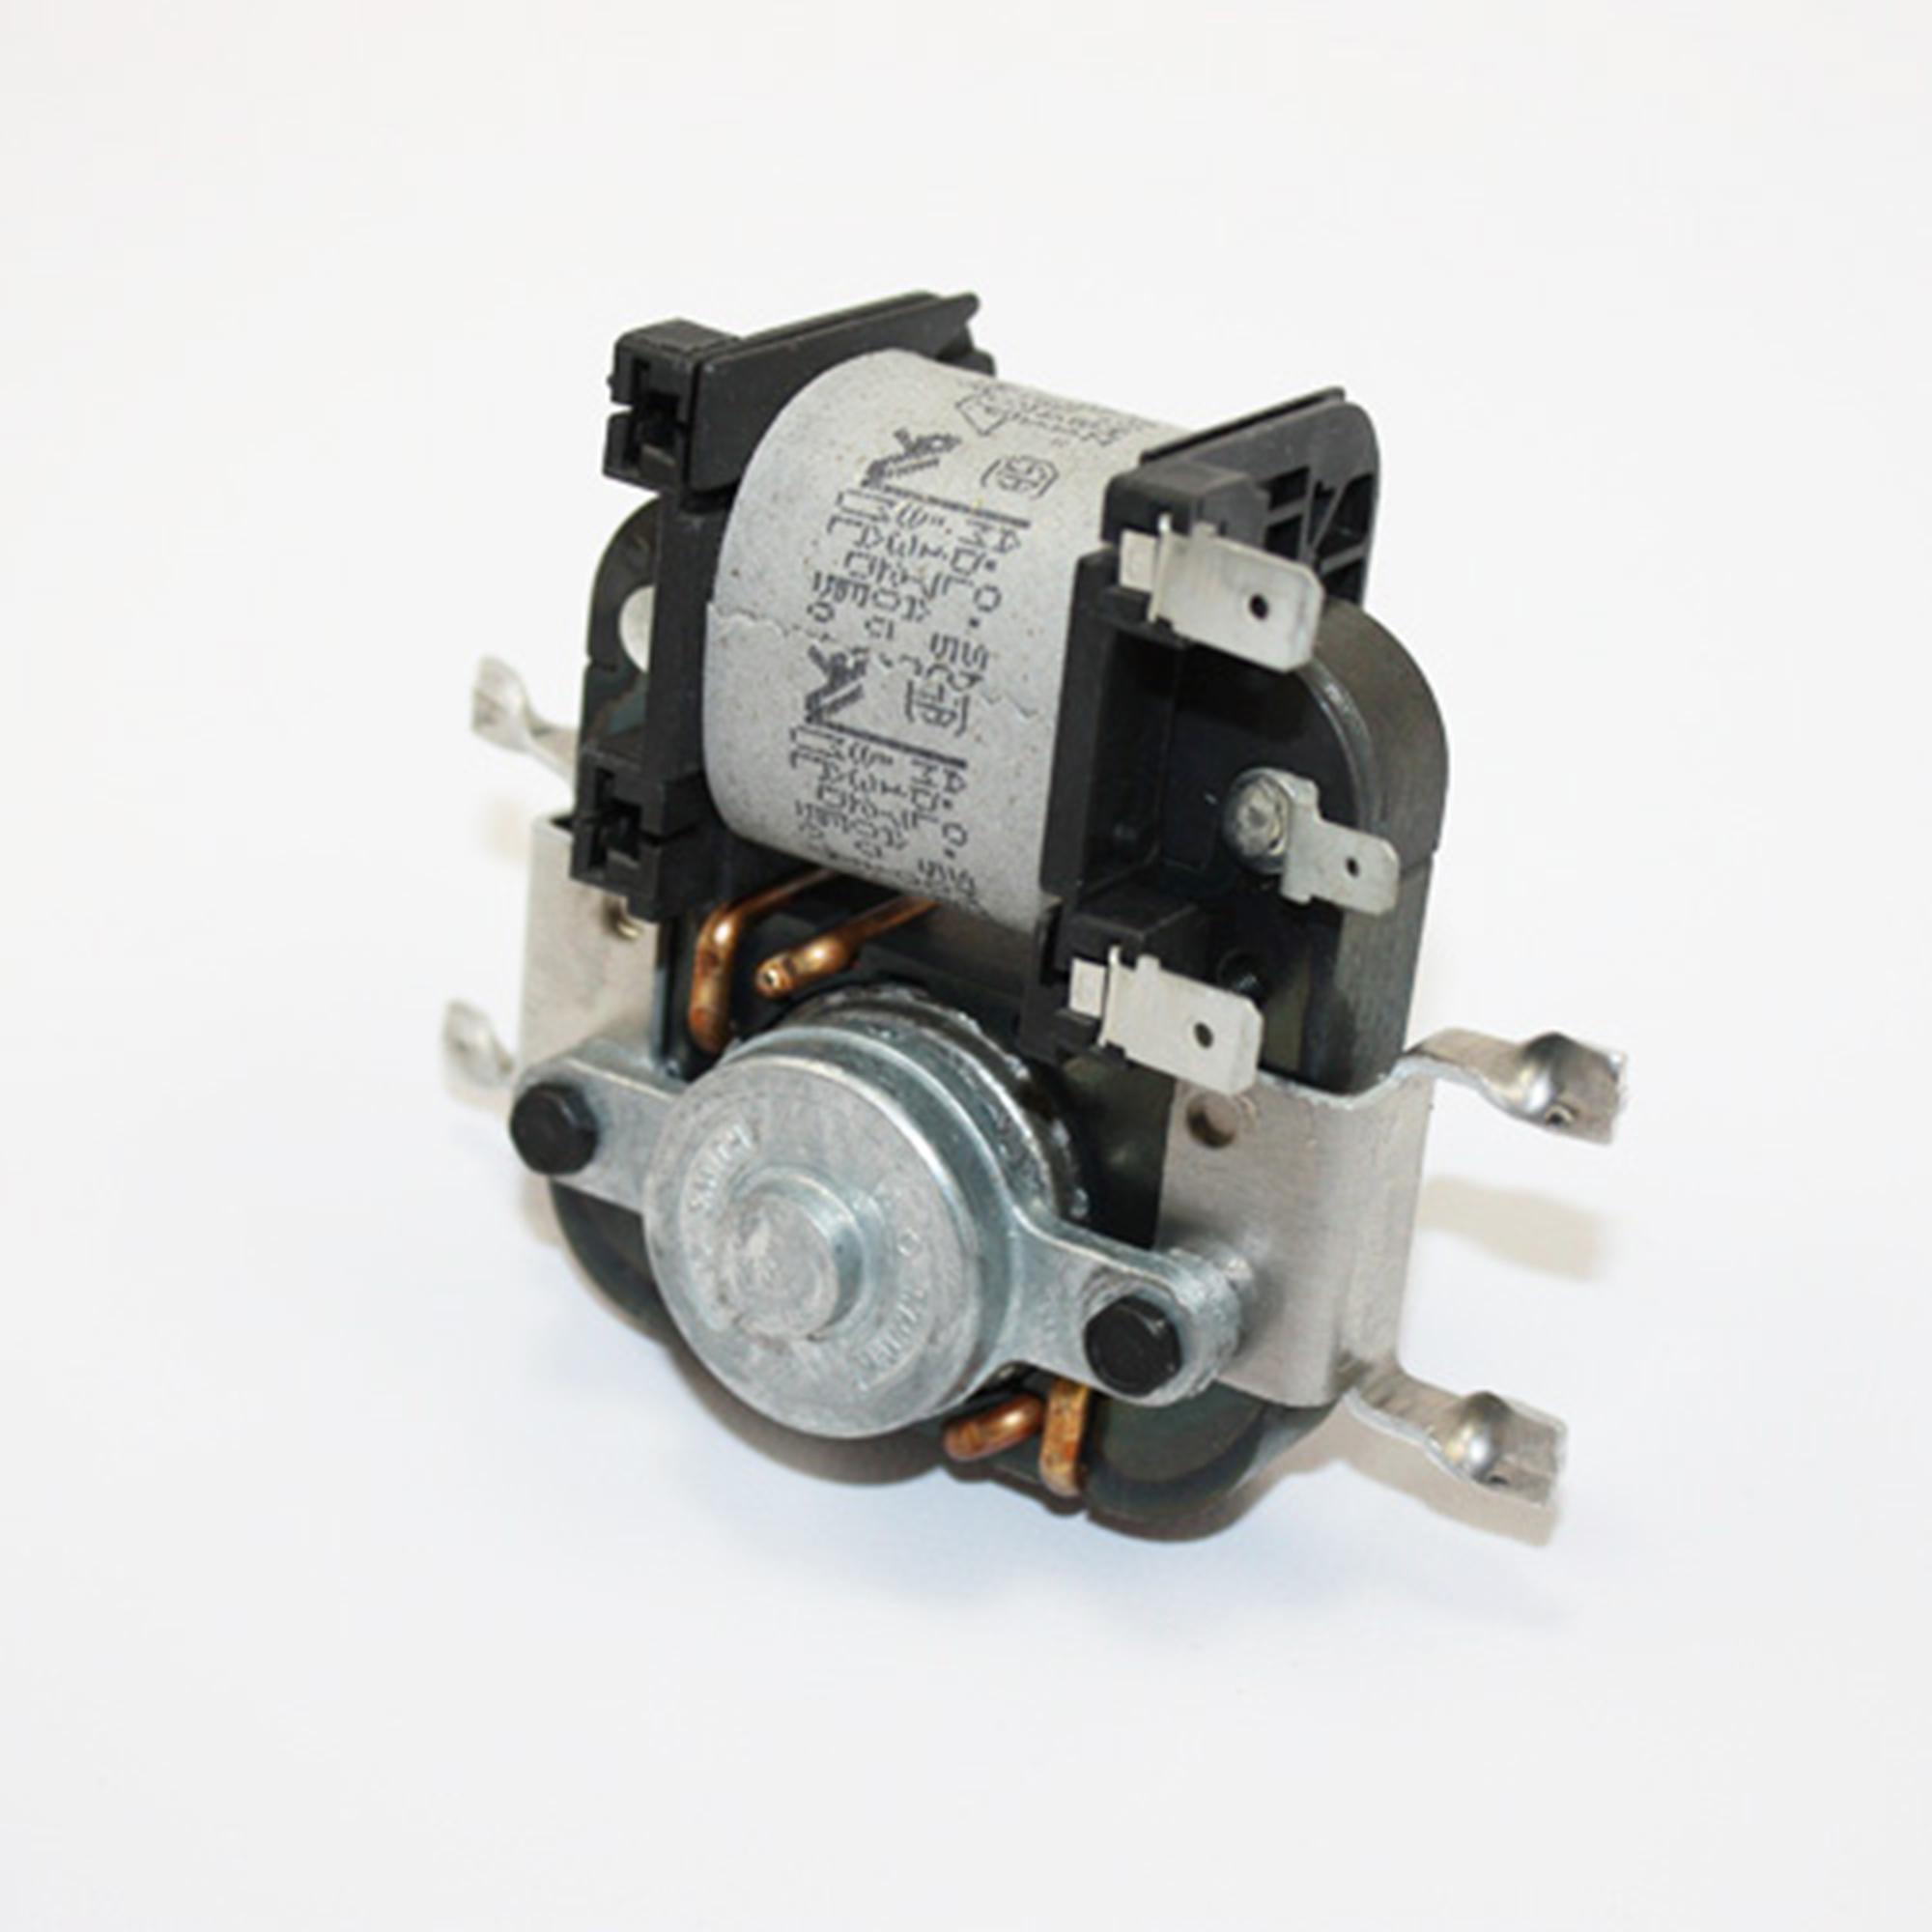 482469 whirlpool refrigerator evaporator fan motor ebay for How to test refrigerator evaporator fan motor